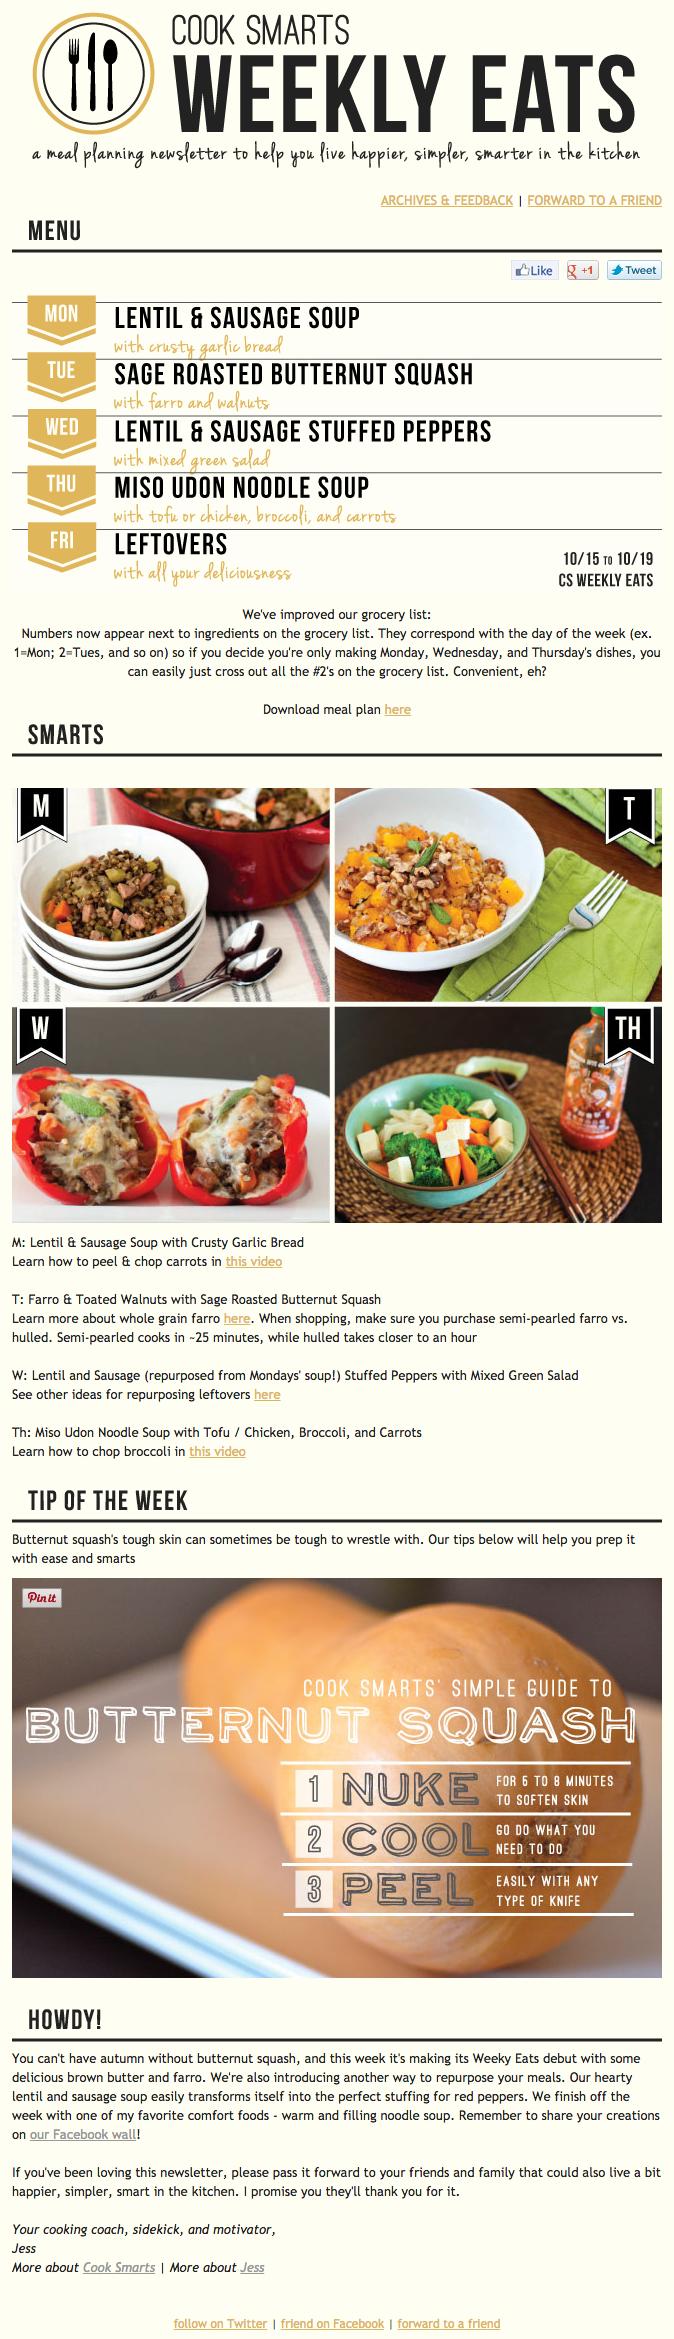 Cook Smarts newsletter